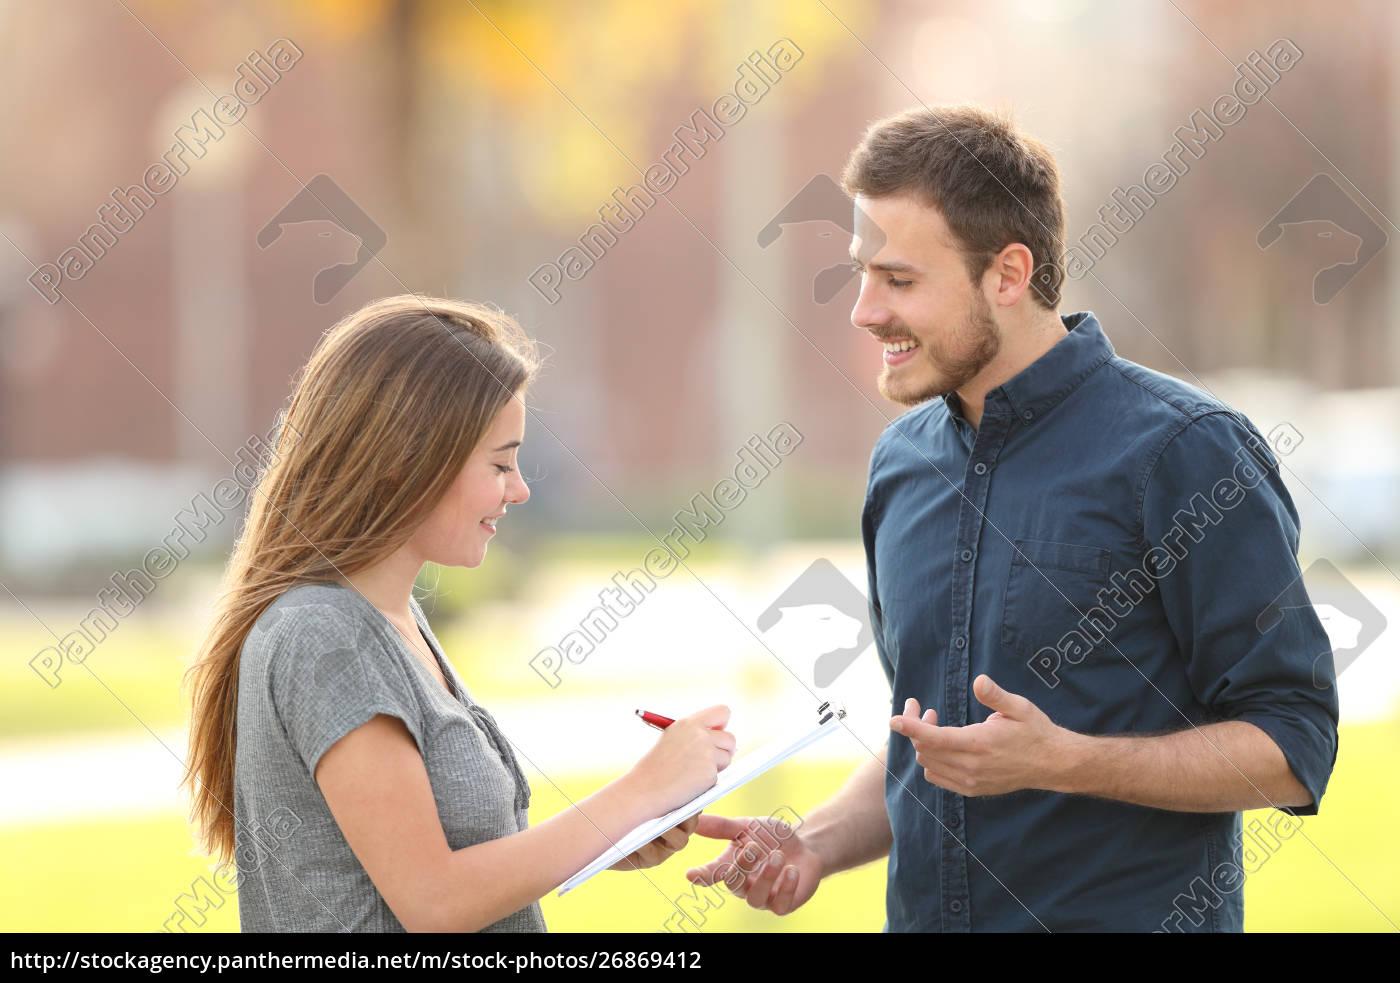 single, man, asking, a, survey, in - 26869412